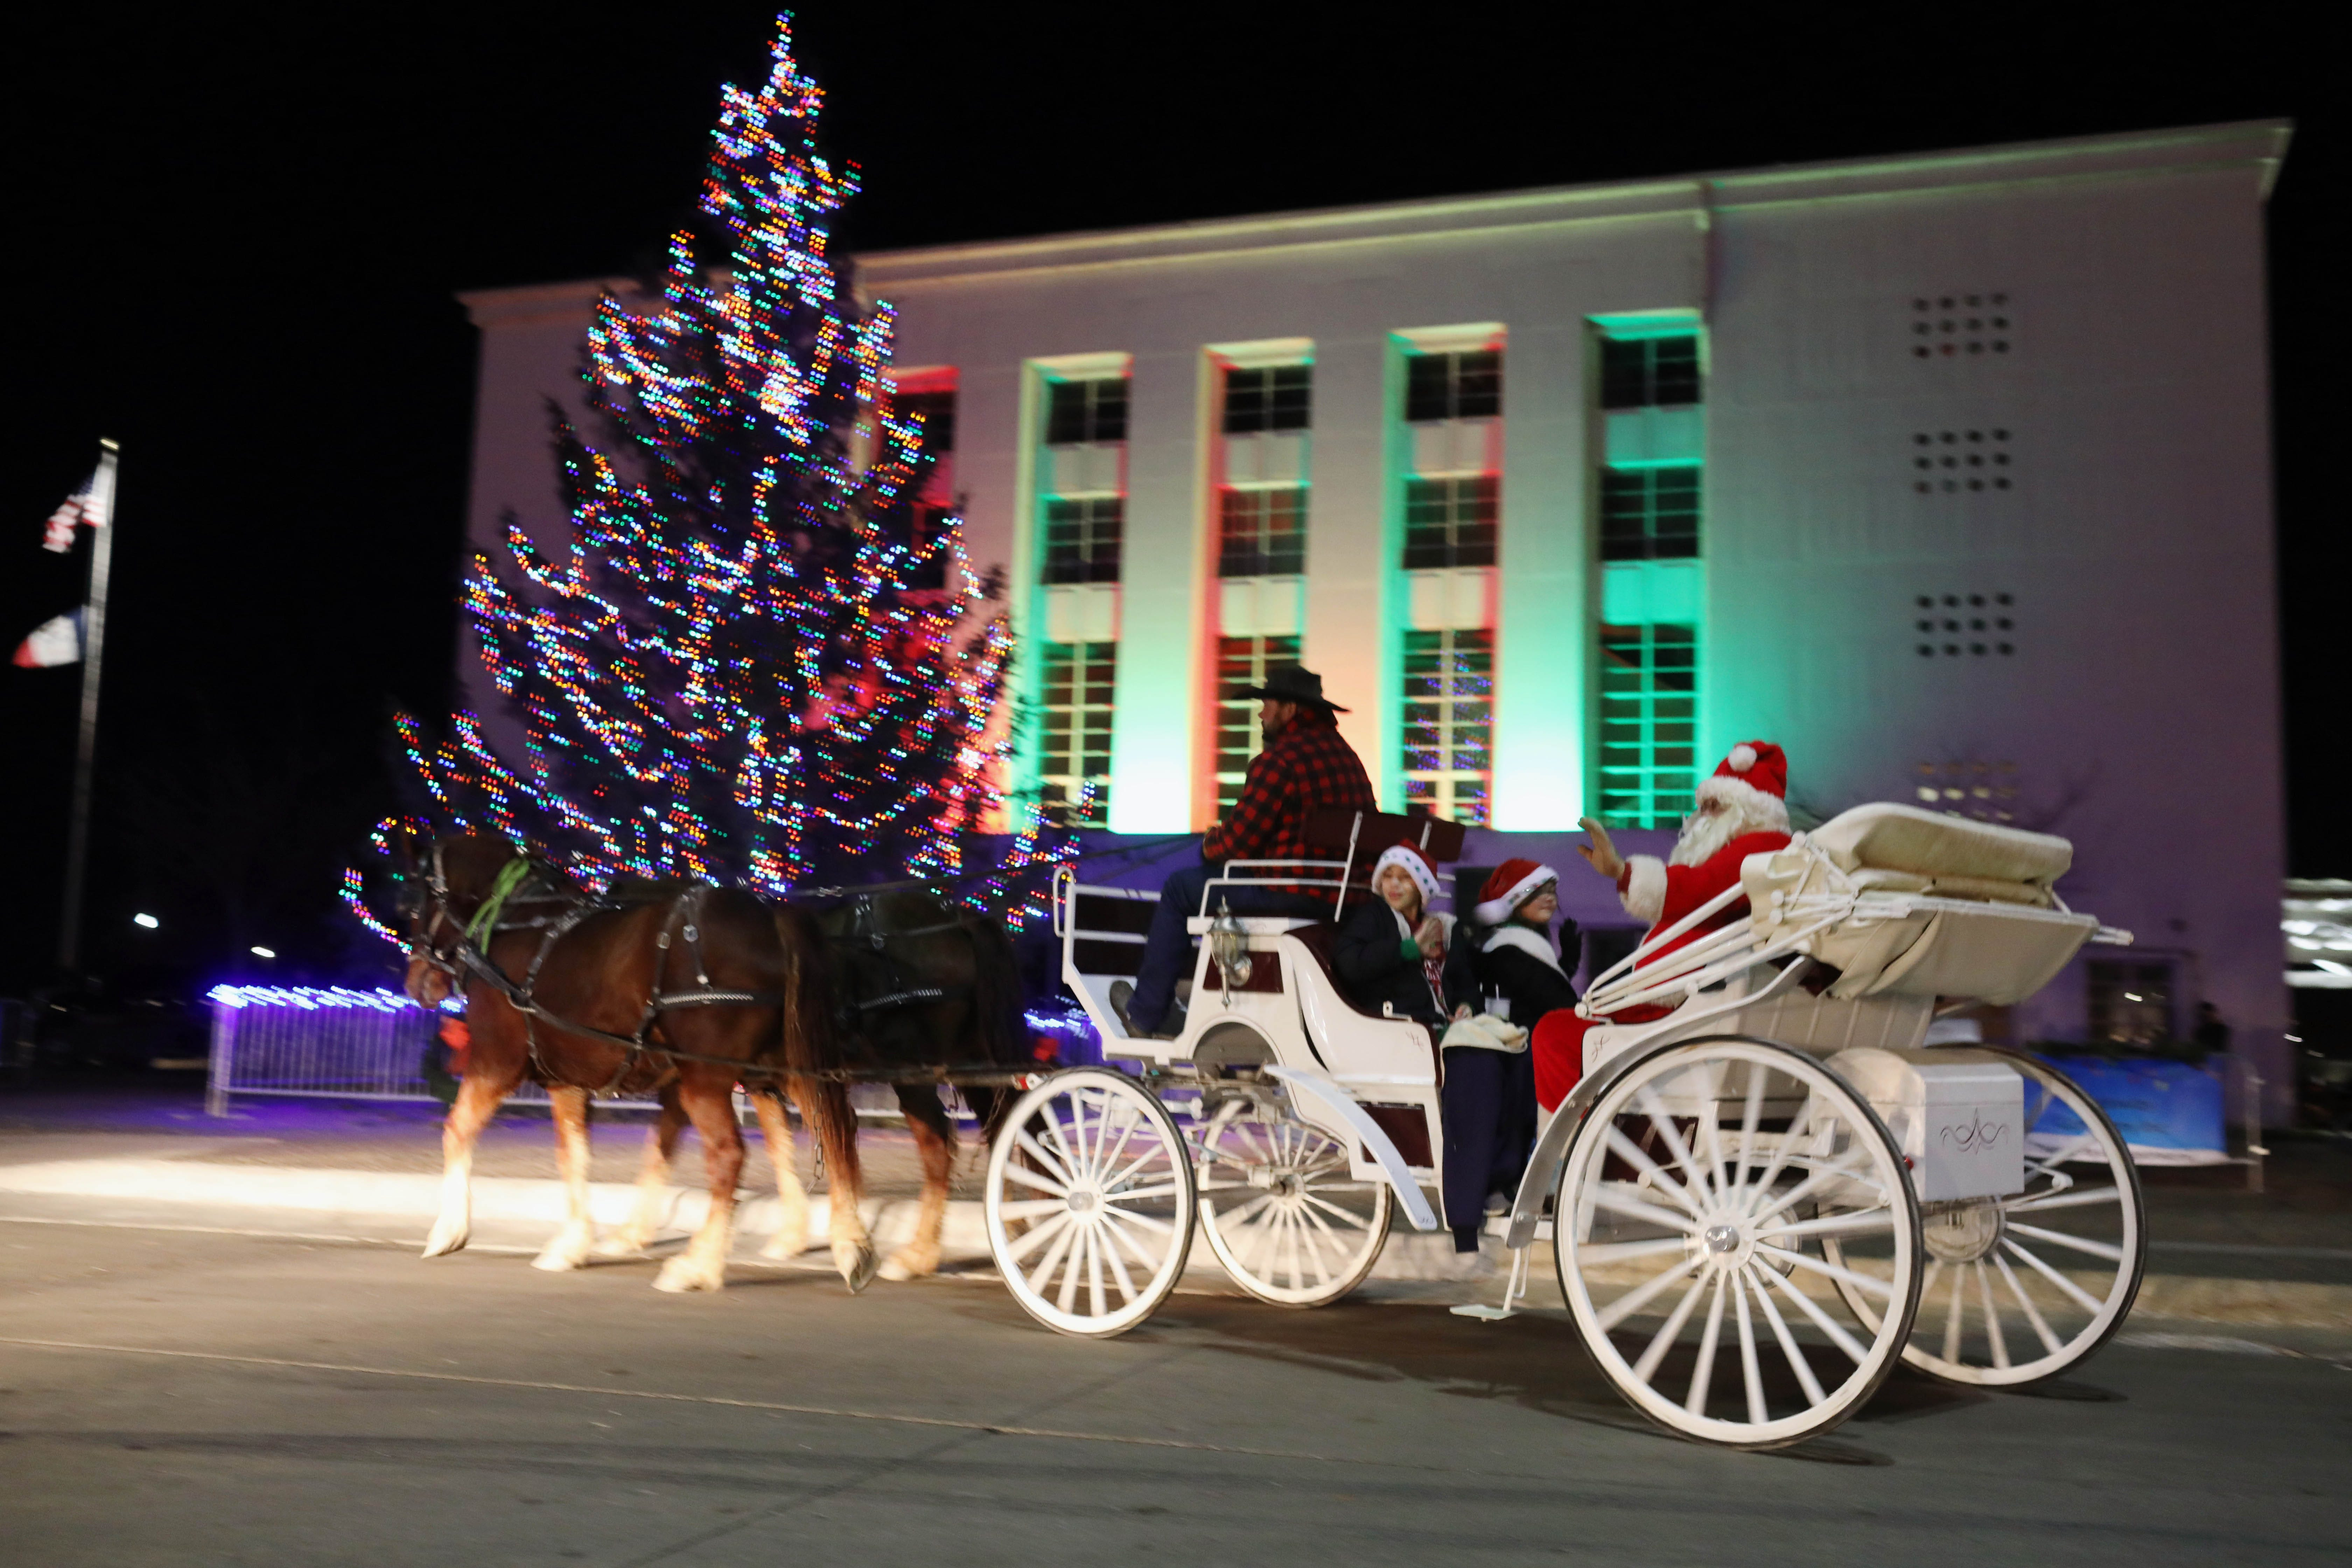 Burlington S Christmas Tree Lights Up Hearts And Minds